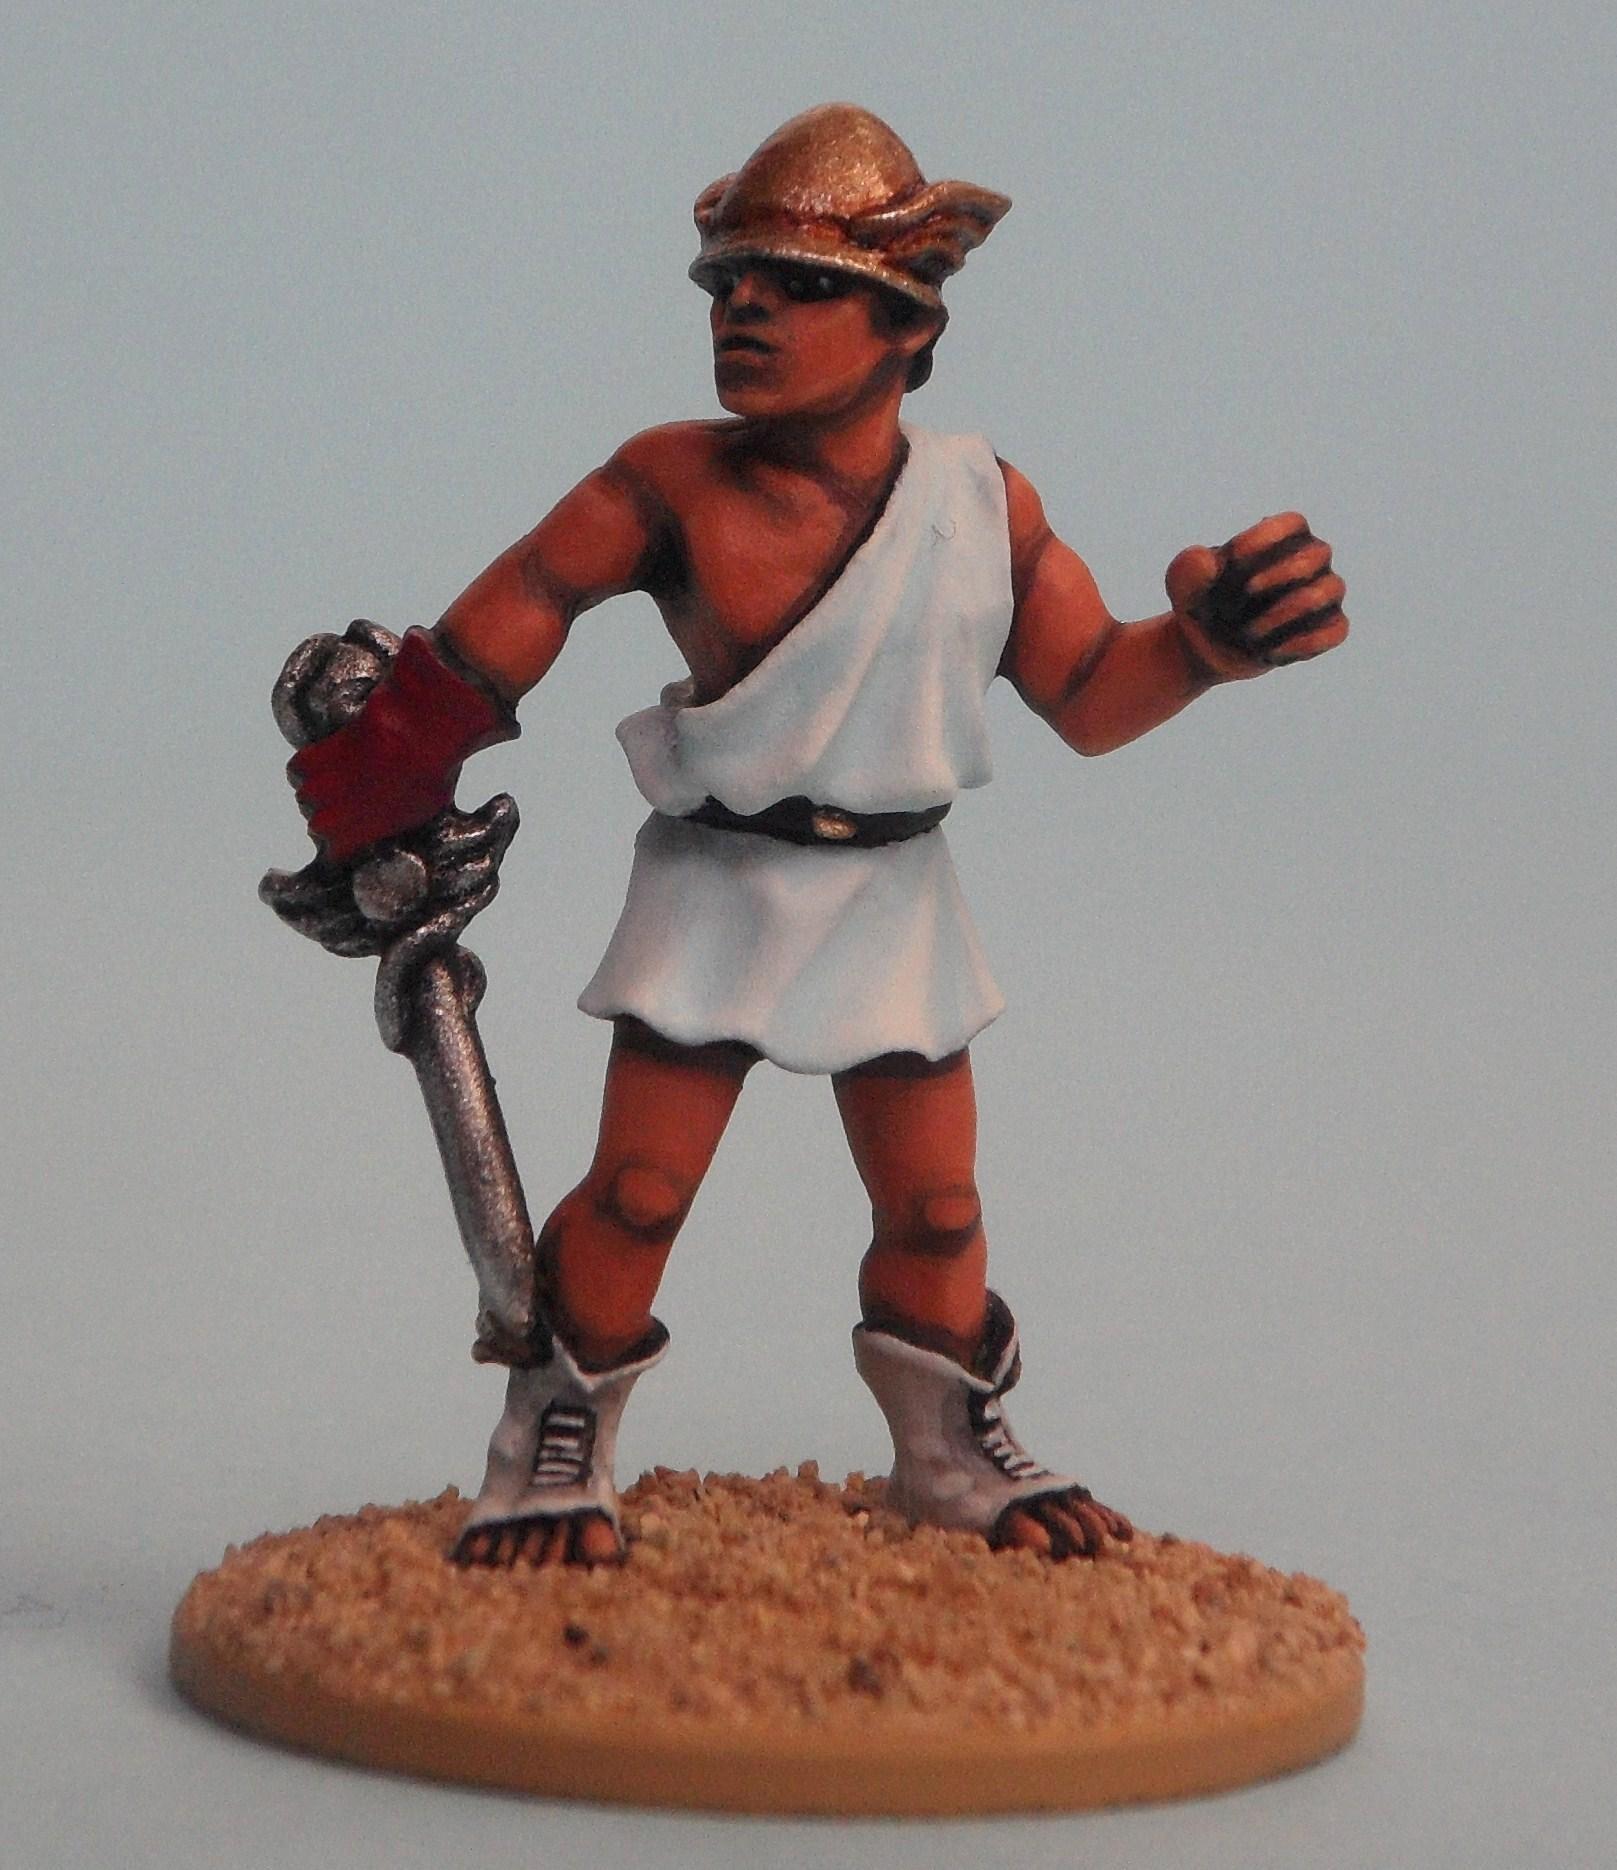 Arena, Foundry, Games, Gladiator, Hermes, Historical, Romans